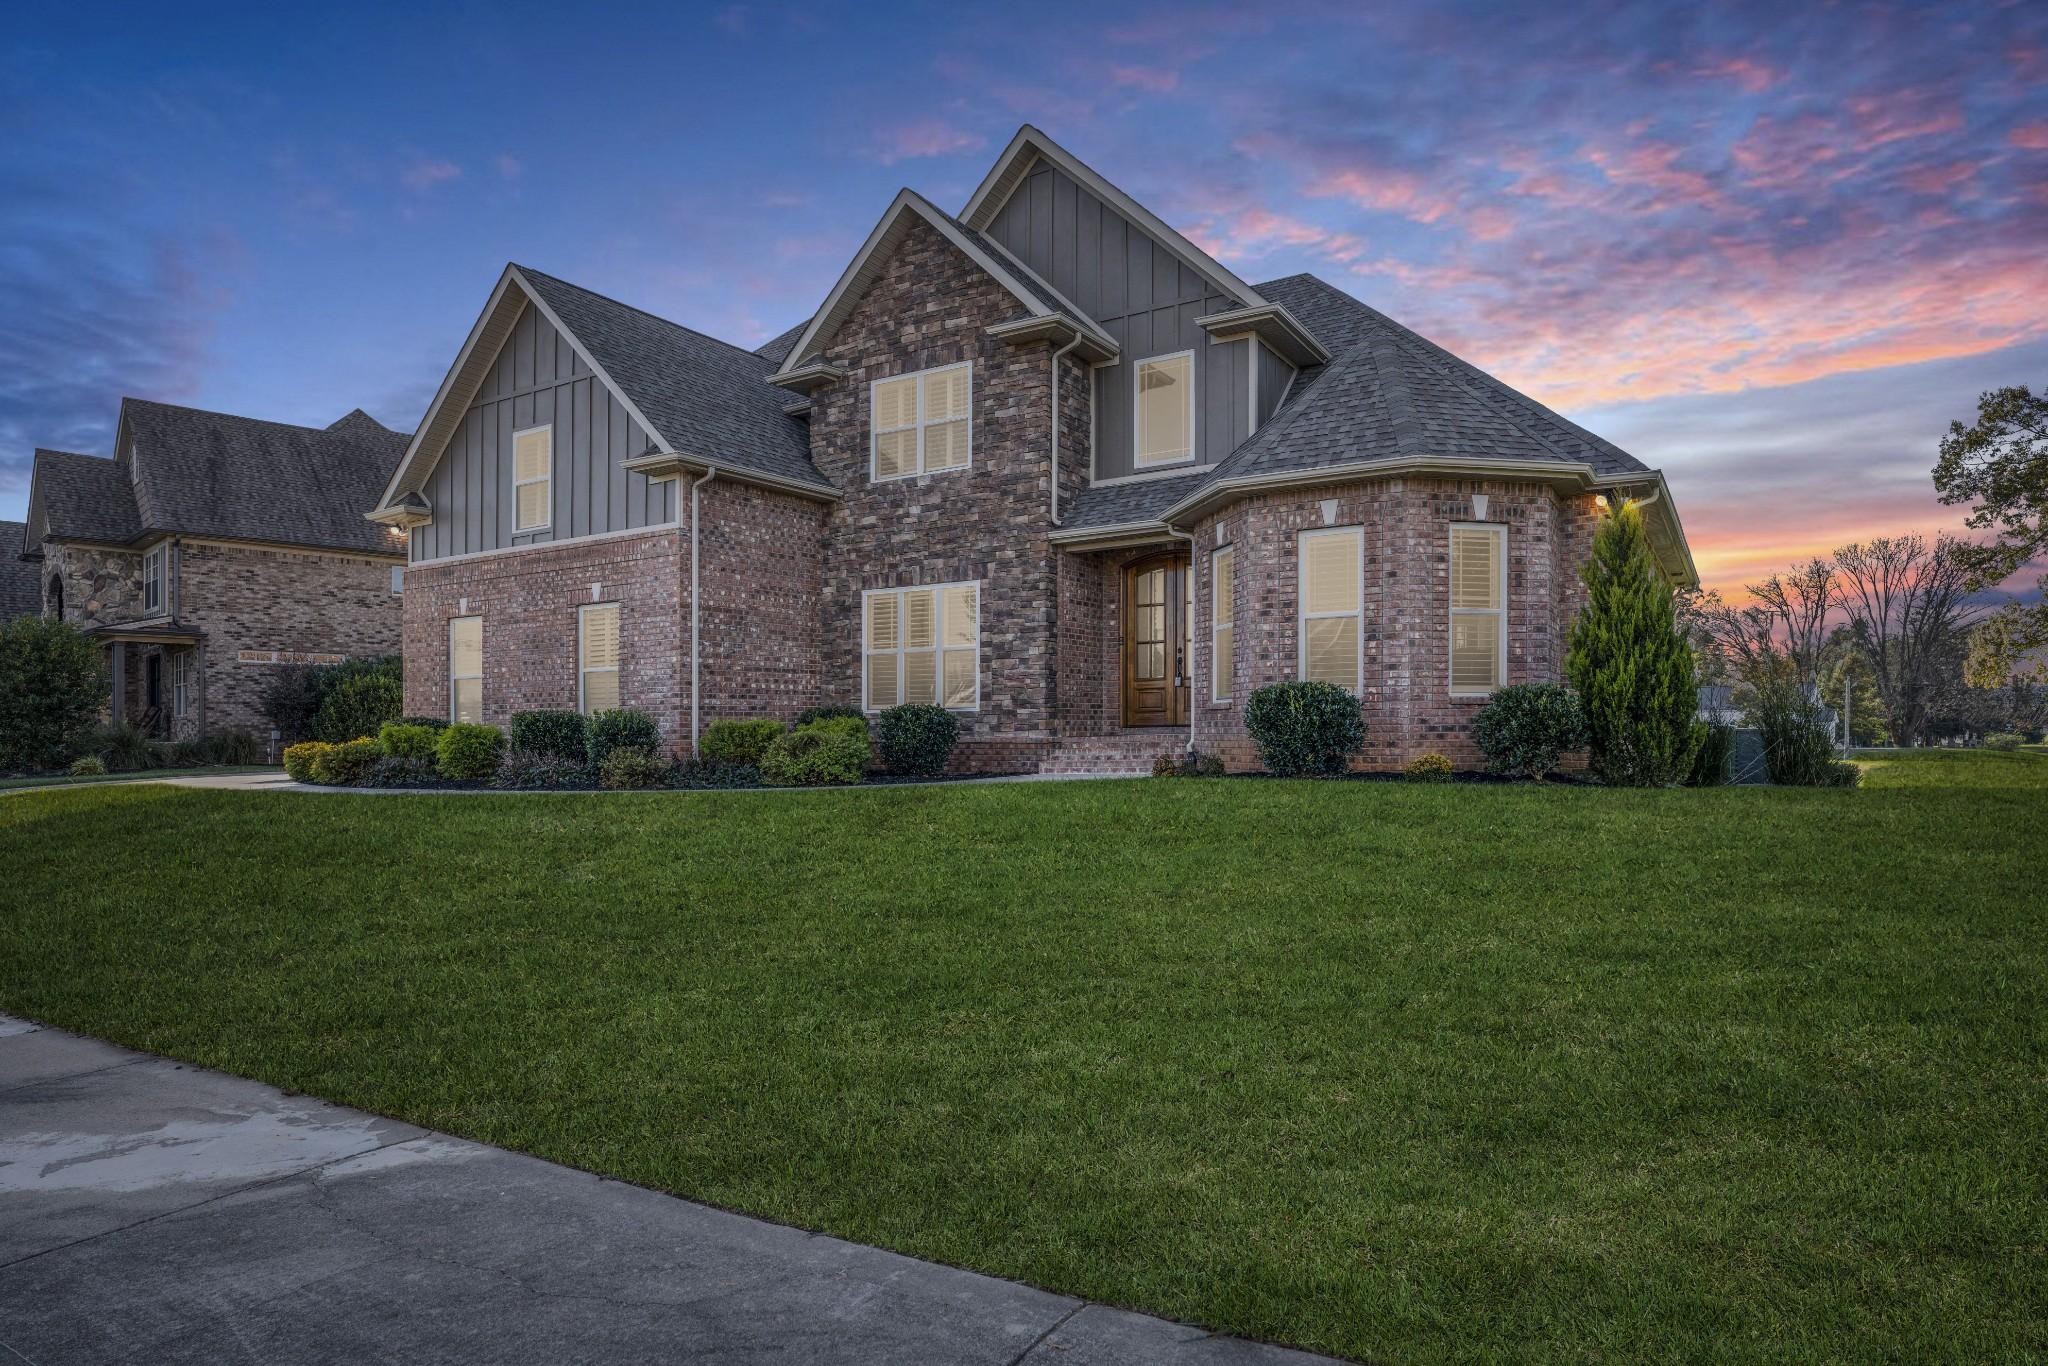 2600 Stone Manor Way, Clarksville, TN 37043 - Clarksville, TN real estate listing